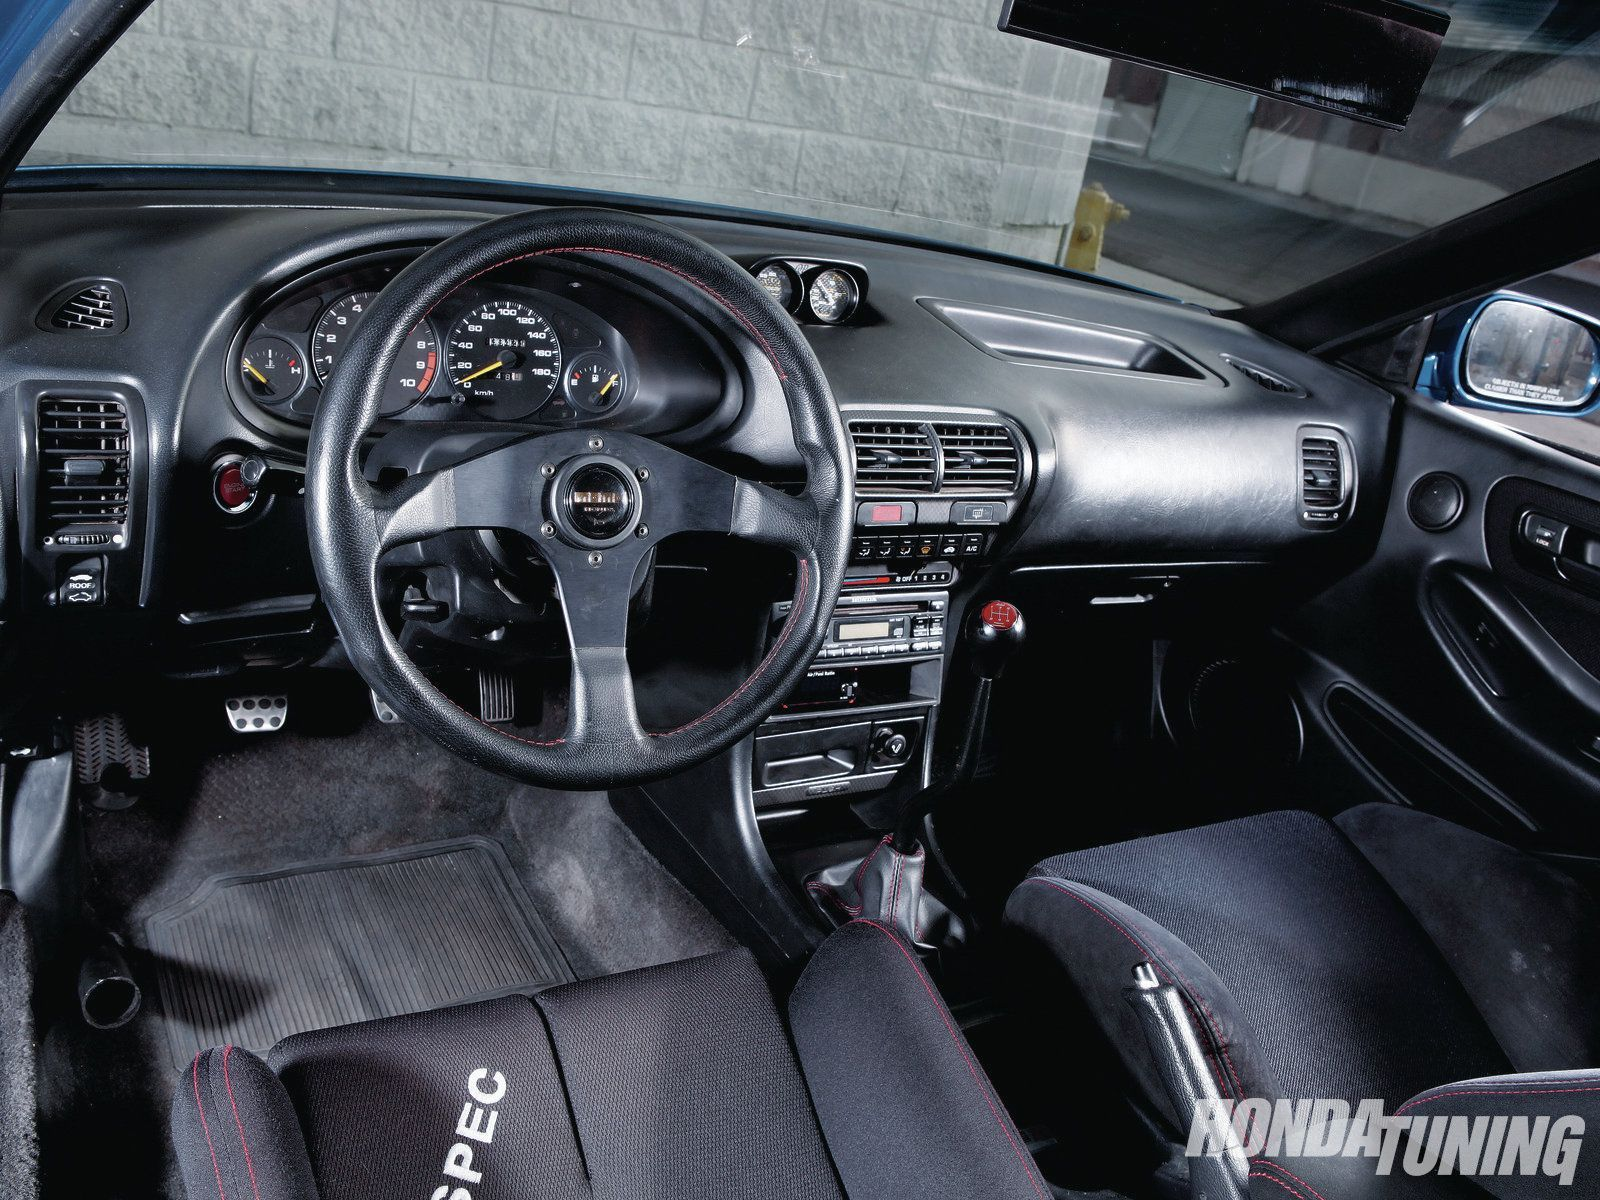 Htup 1203 07 1996 Acura Integra Gs R Interior Acura Integra Acura Honda